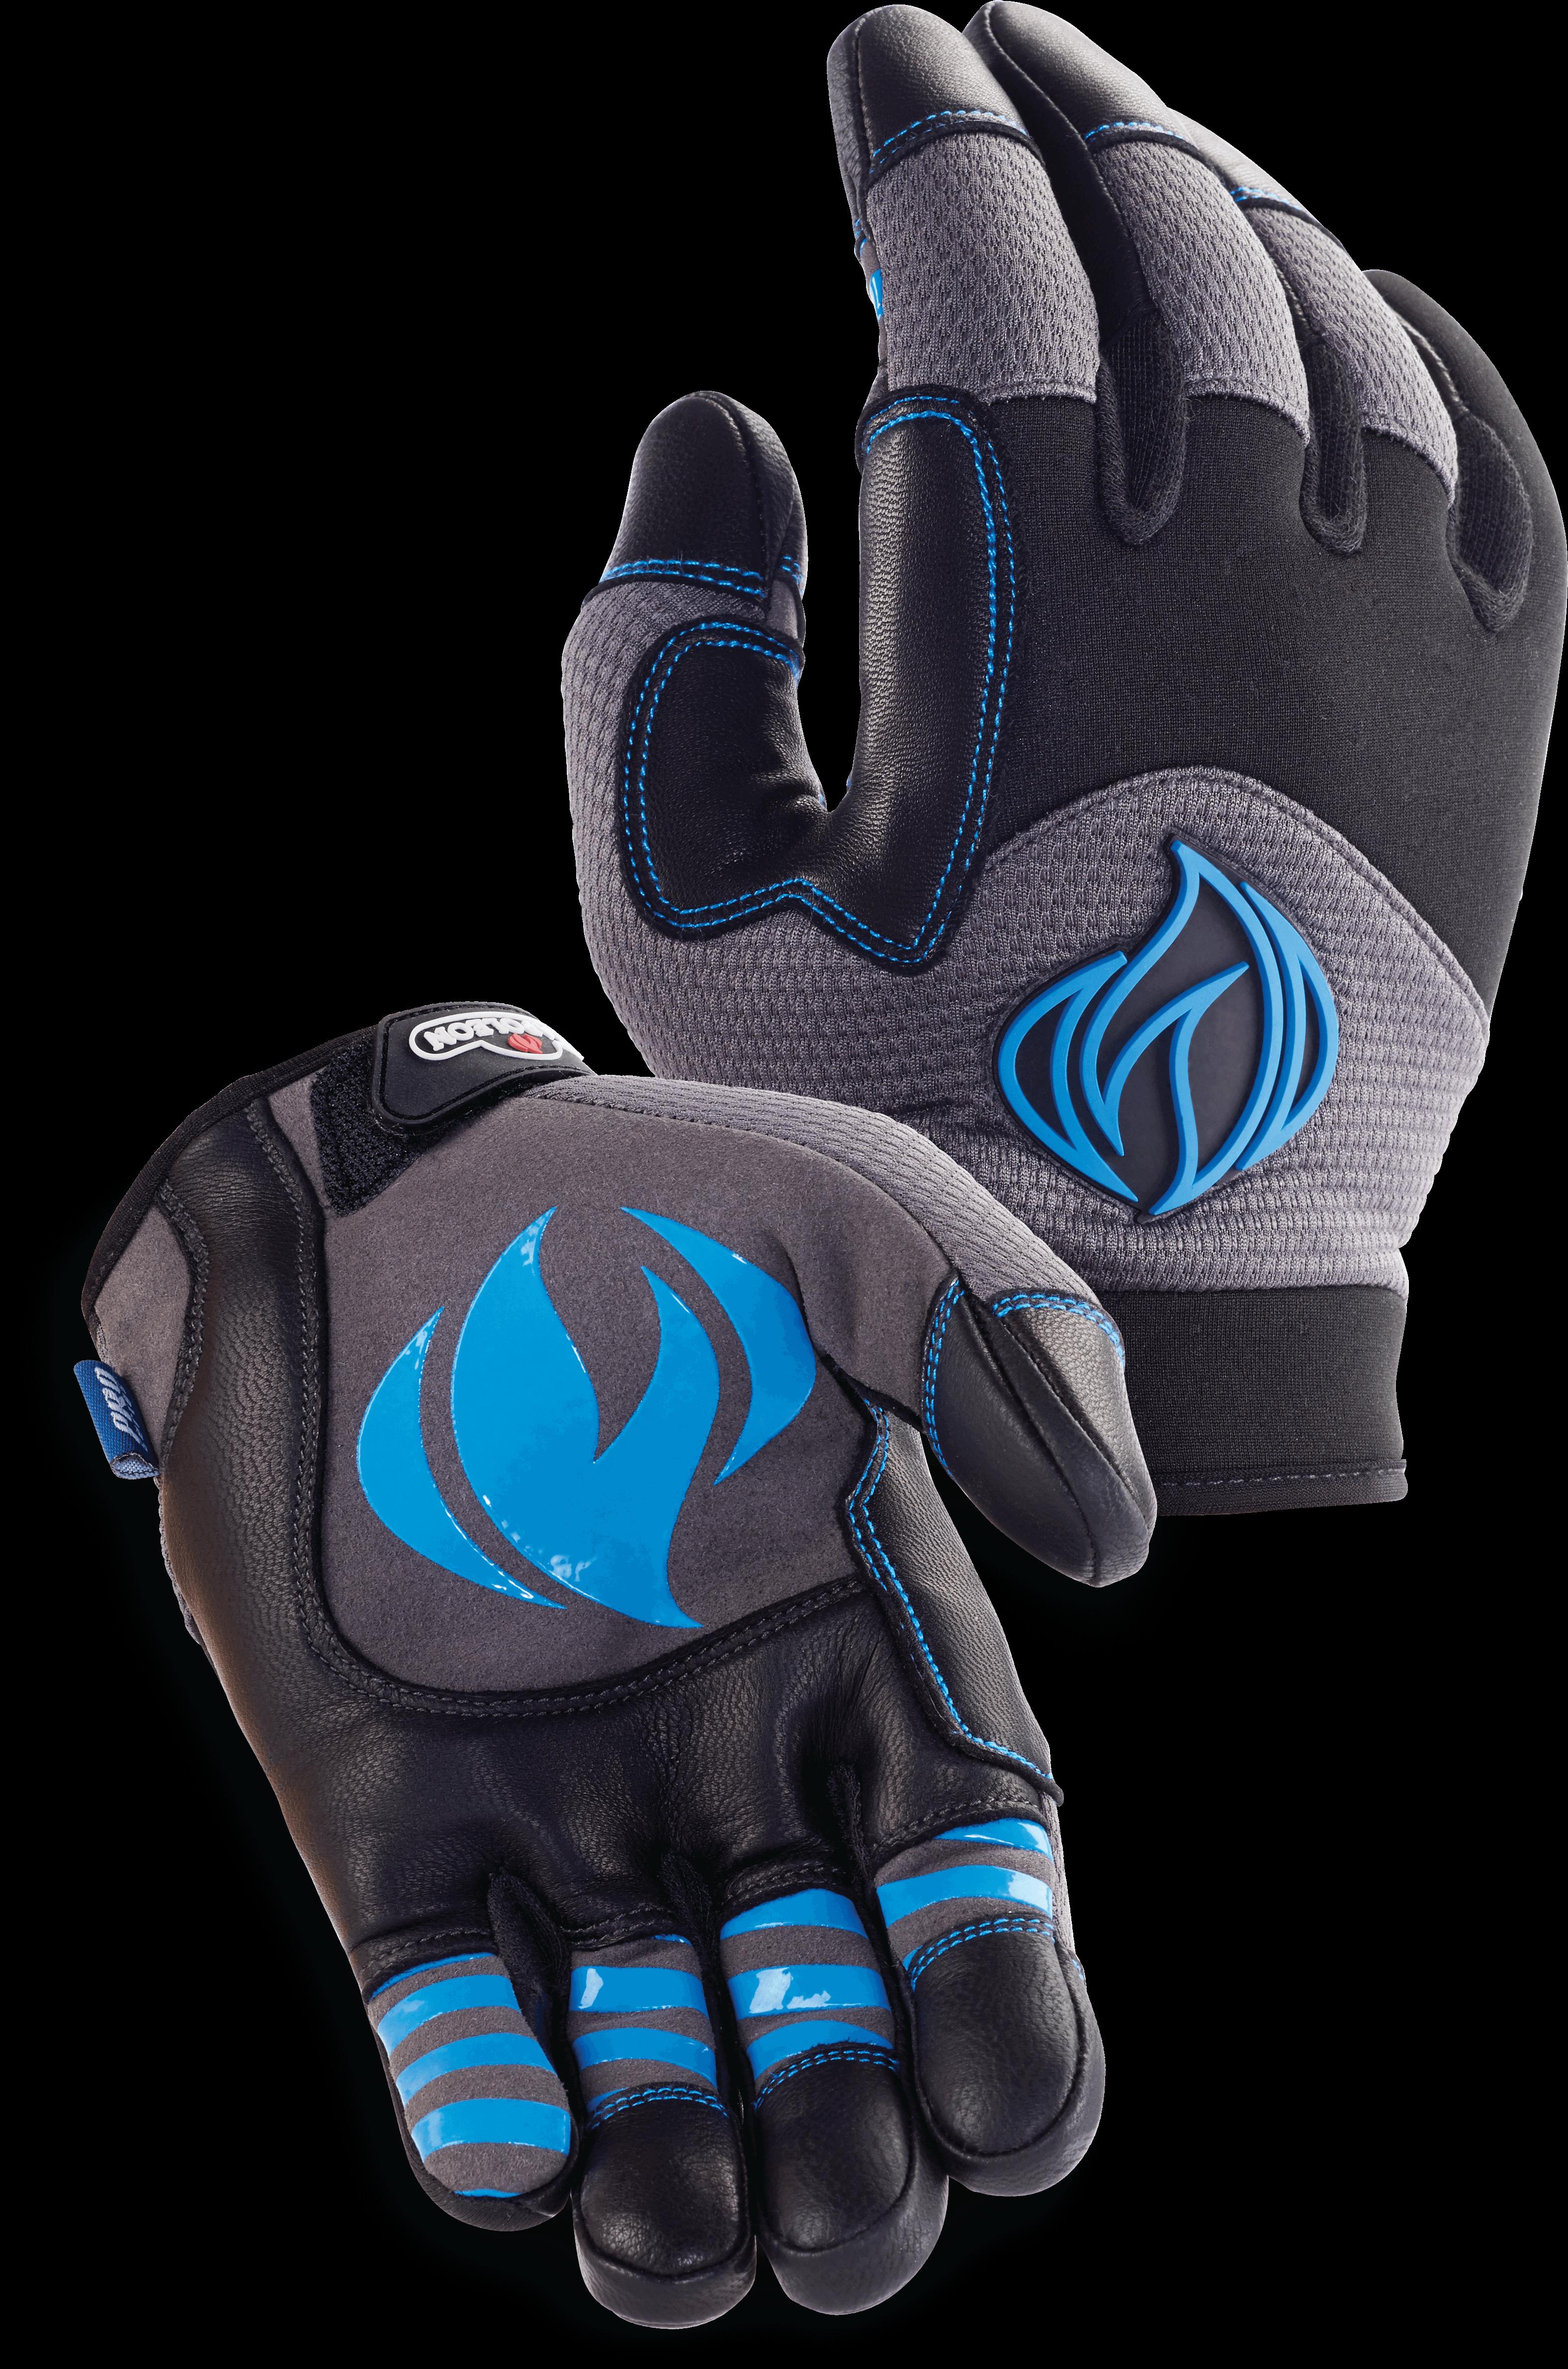 Napoleon Multi-Use Touchscreen Gloves (L)